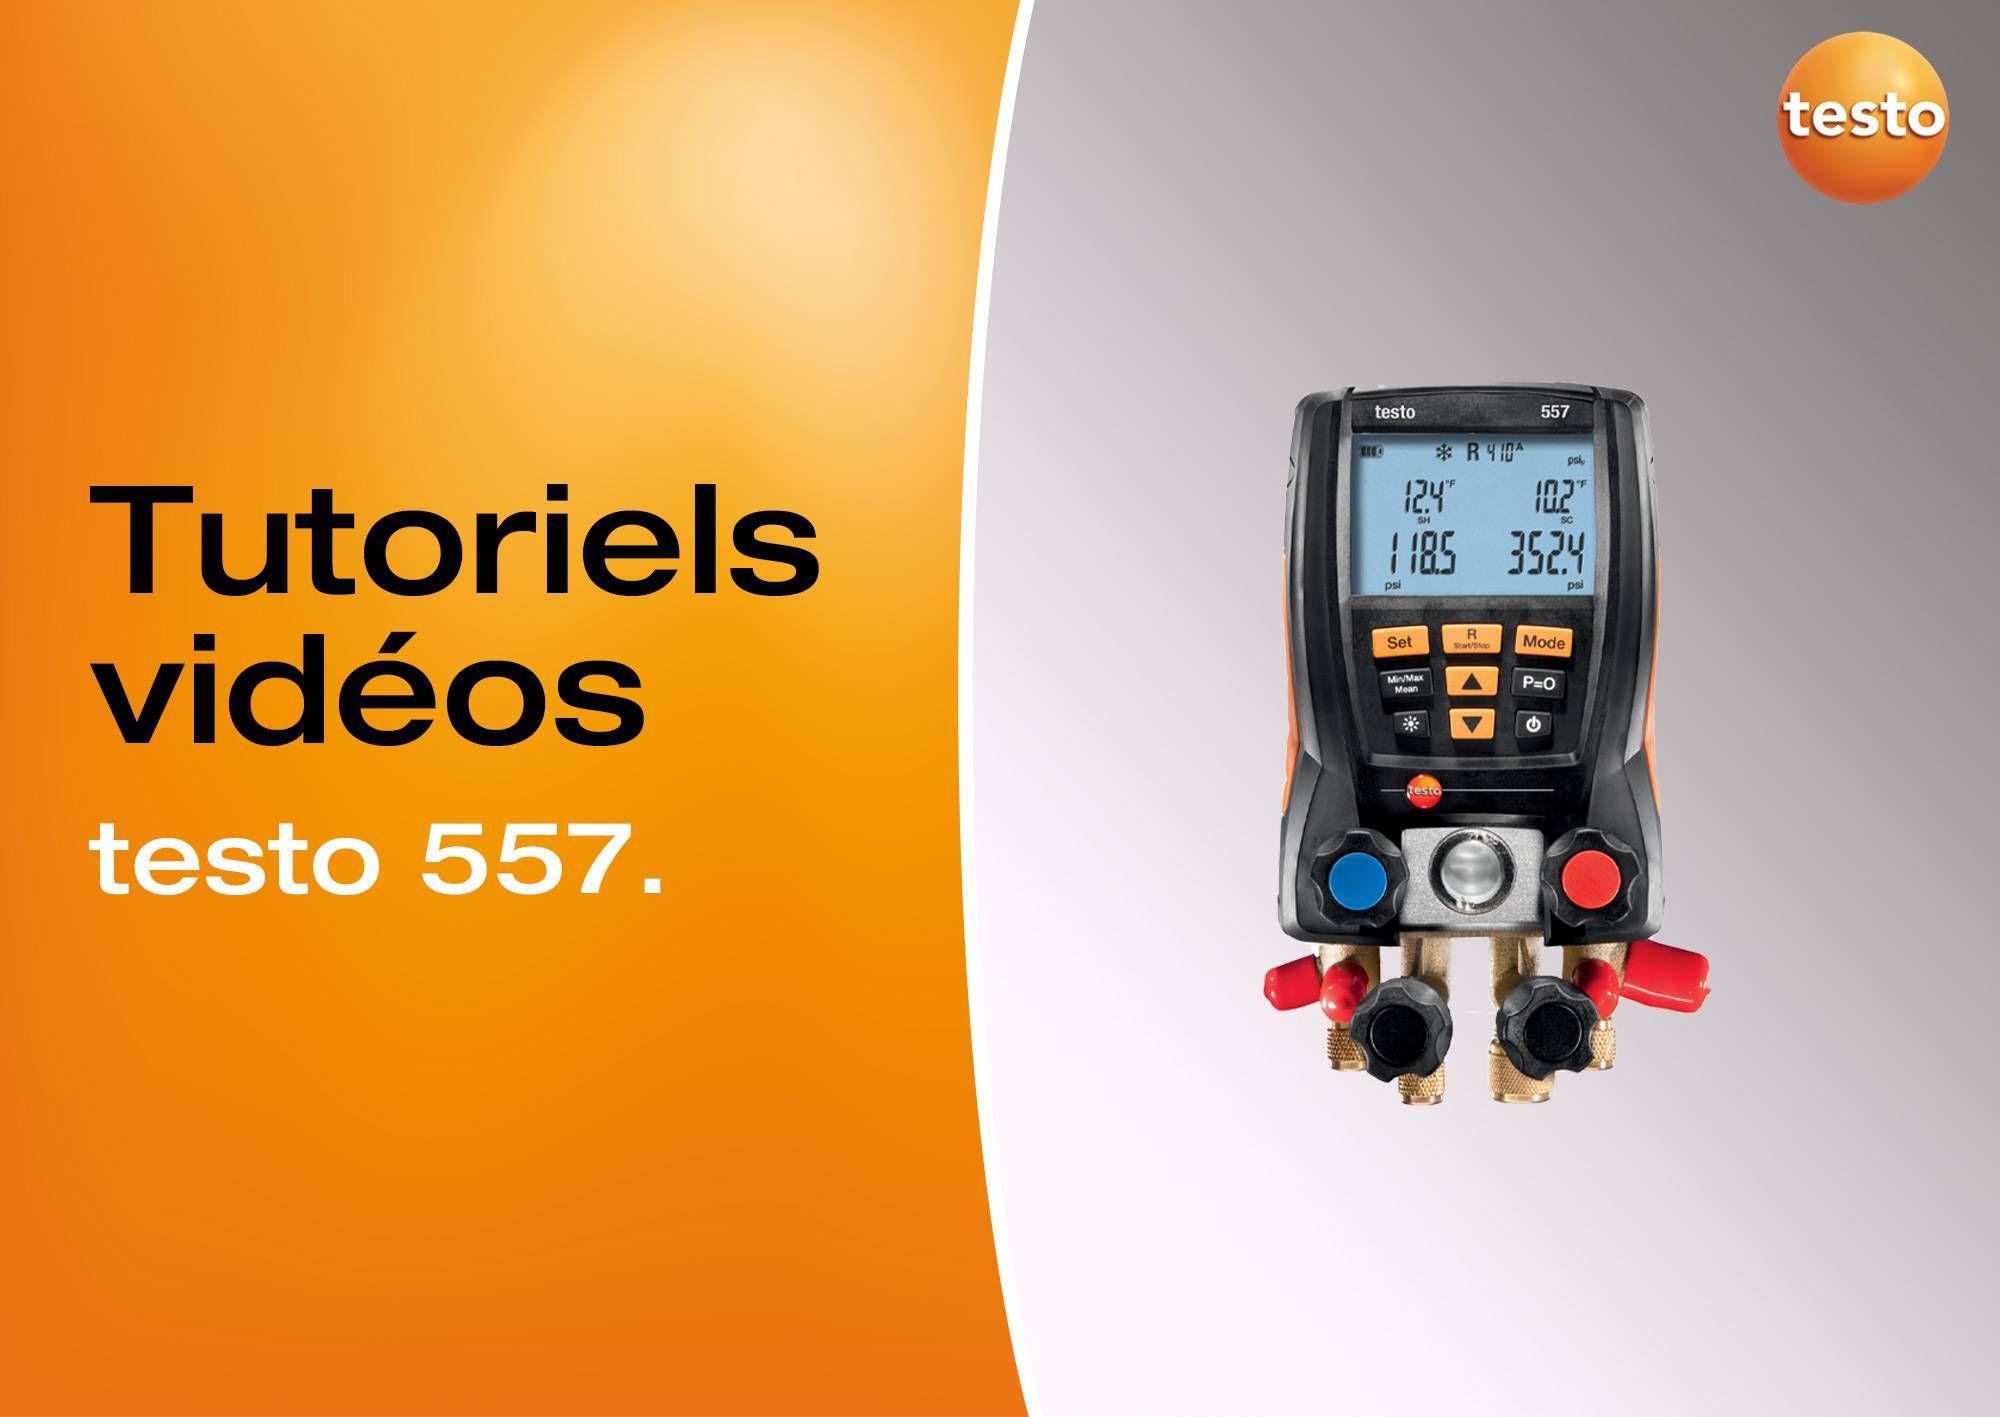 Tutoriels vidéos utilisation manomètre testo 557